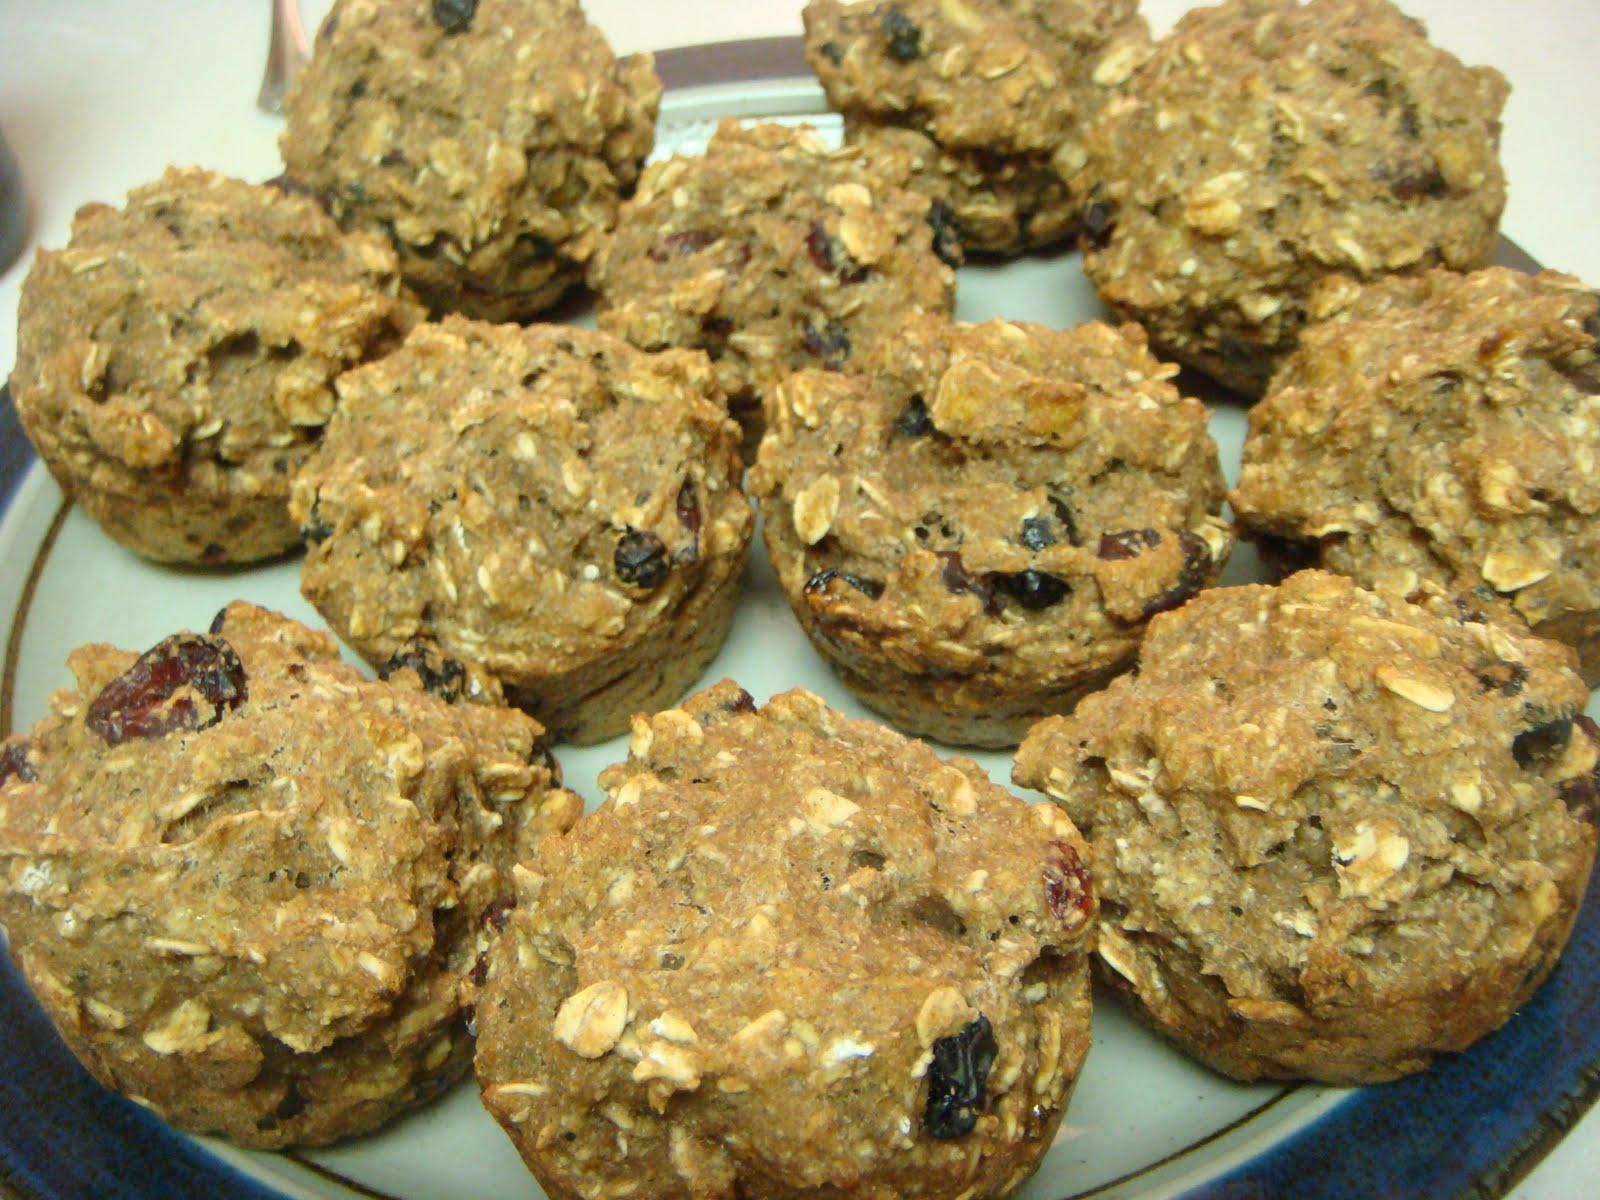 Hawaii oat cake recipe